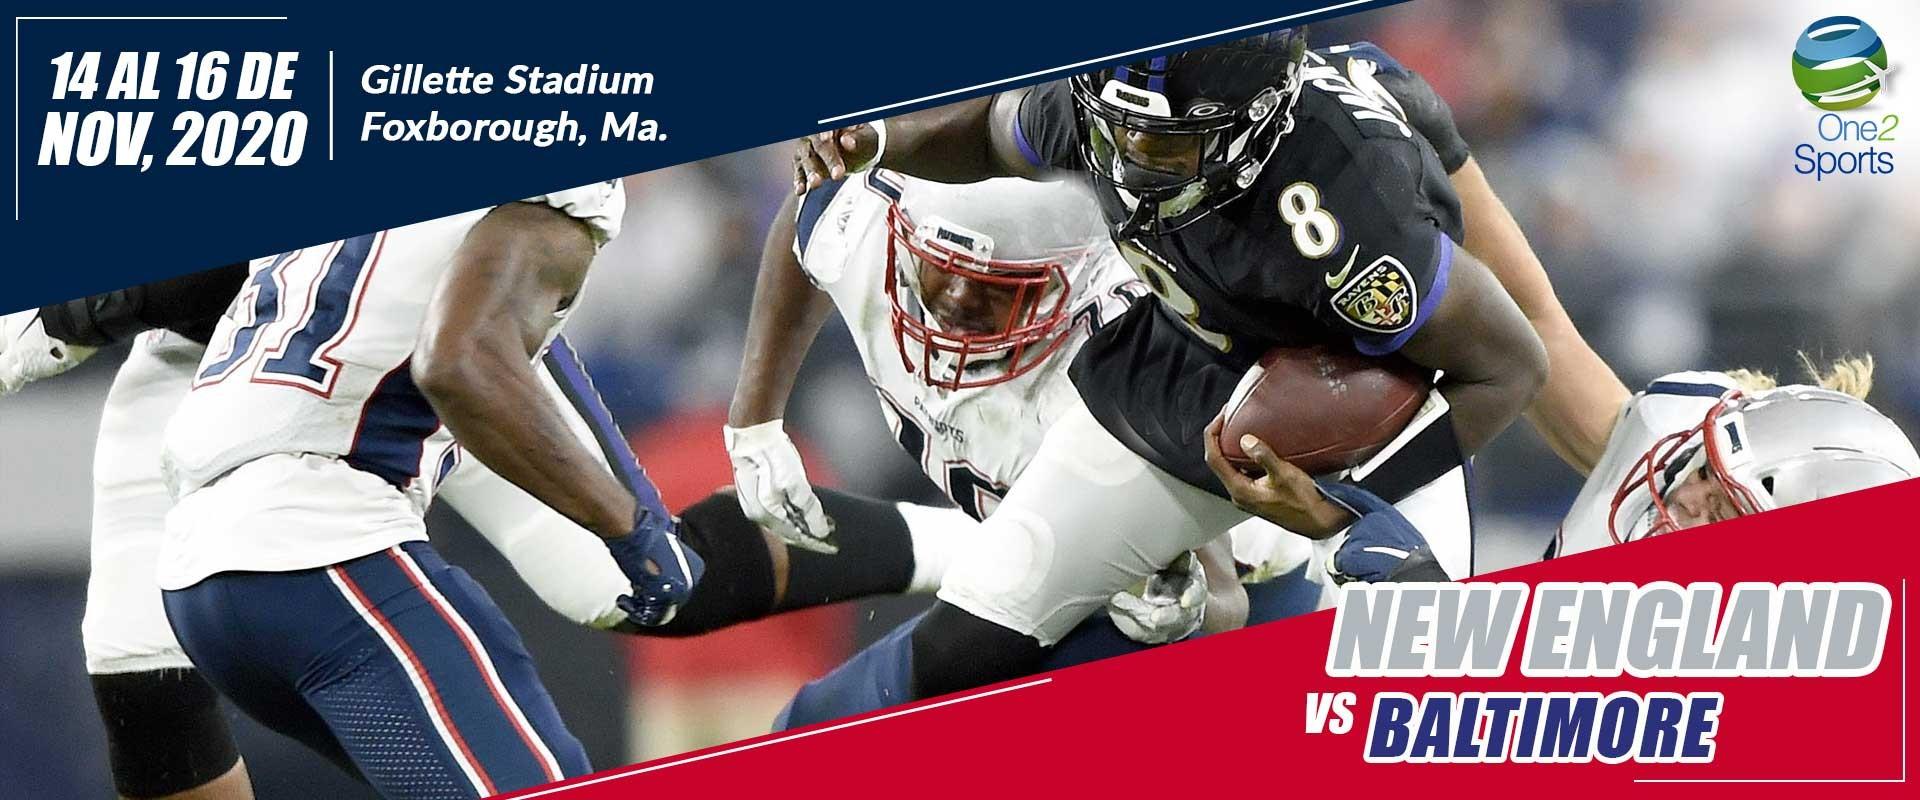 New England vs Baltimore